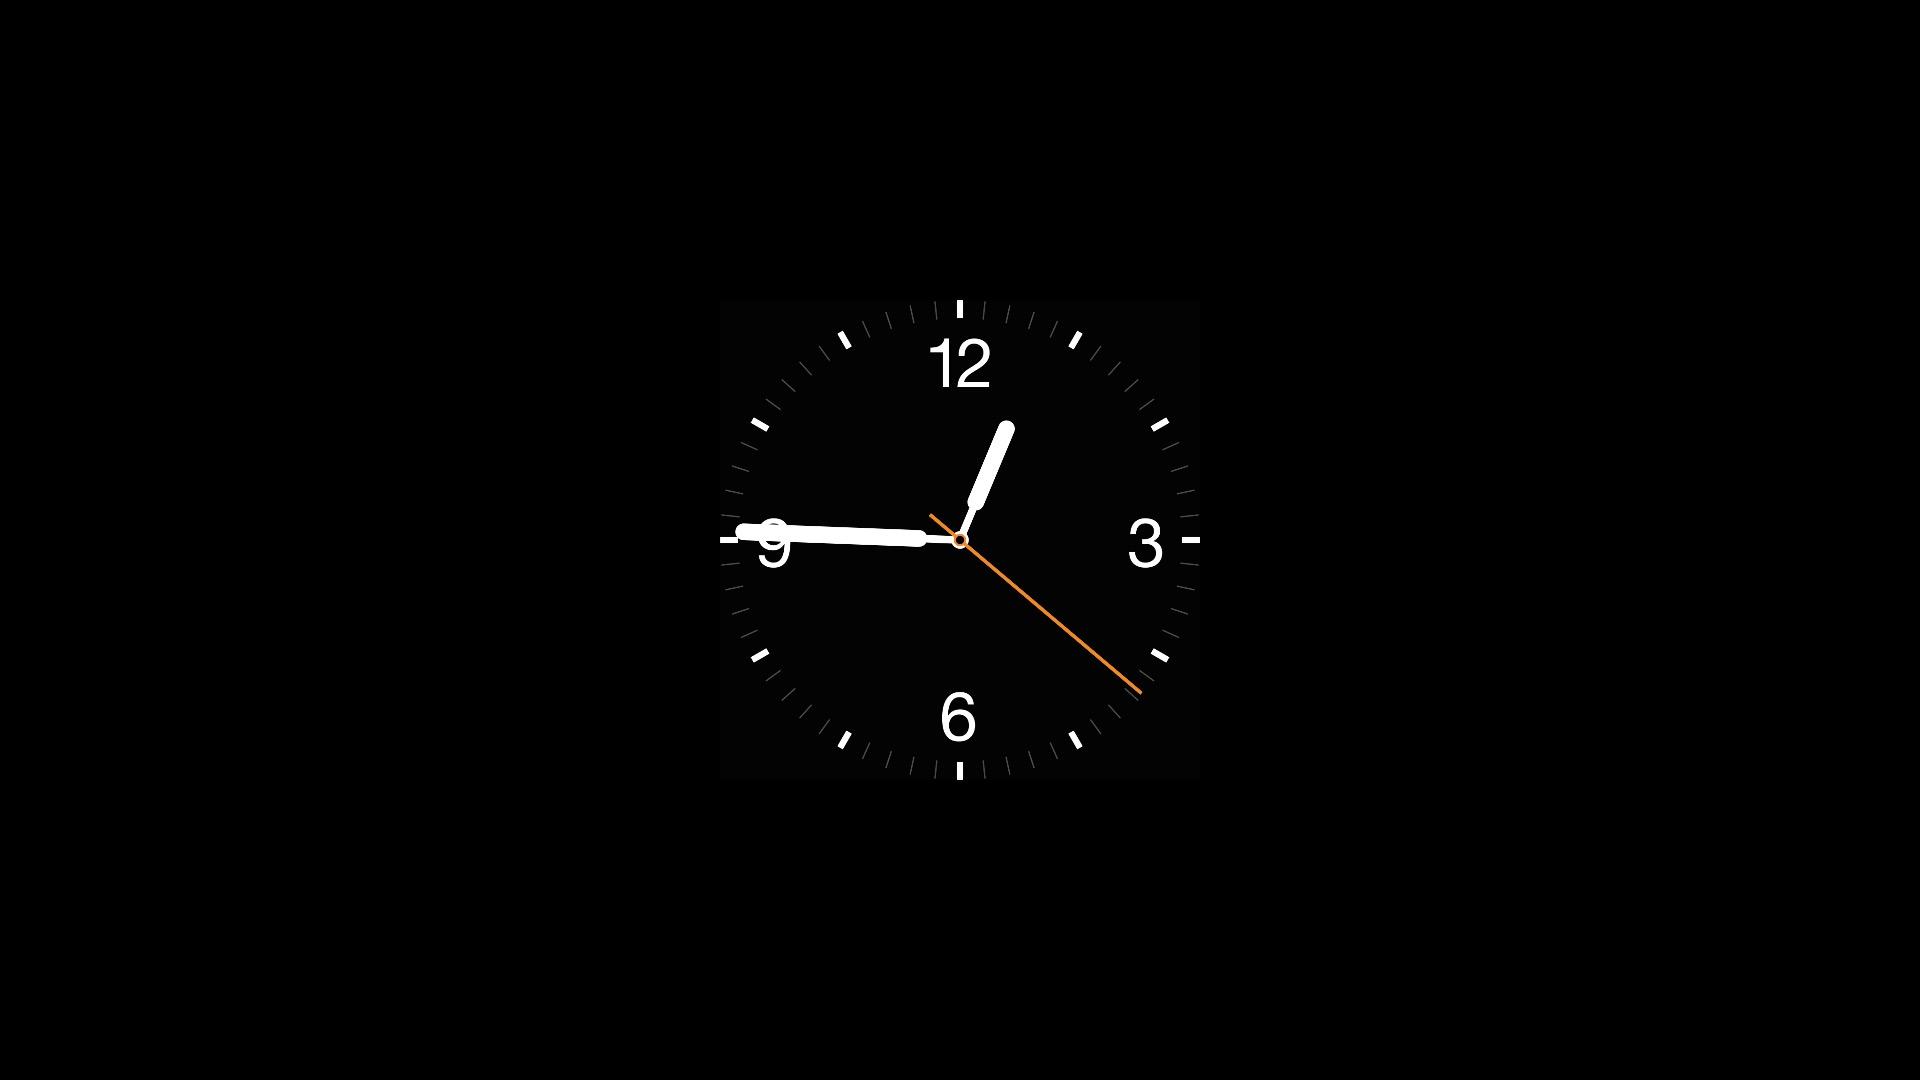 Lock Screen Wallpaper Iphone 7 Get A Nifty Apple Watch Screen Saver On Mac Os X